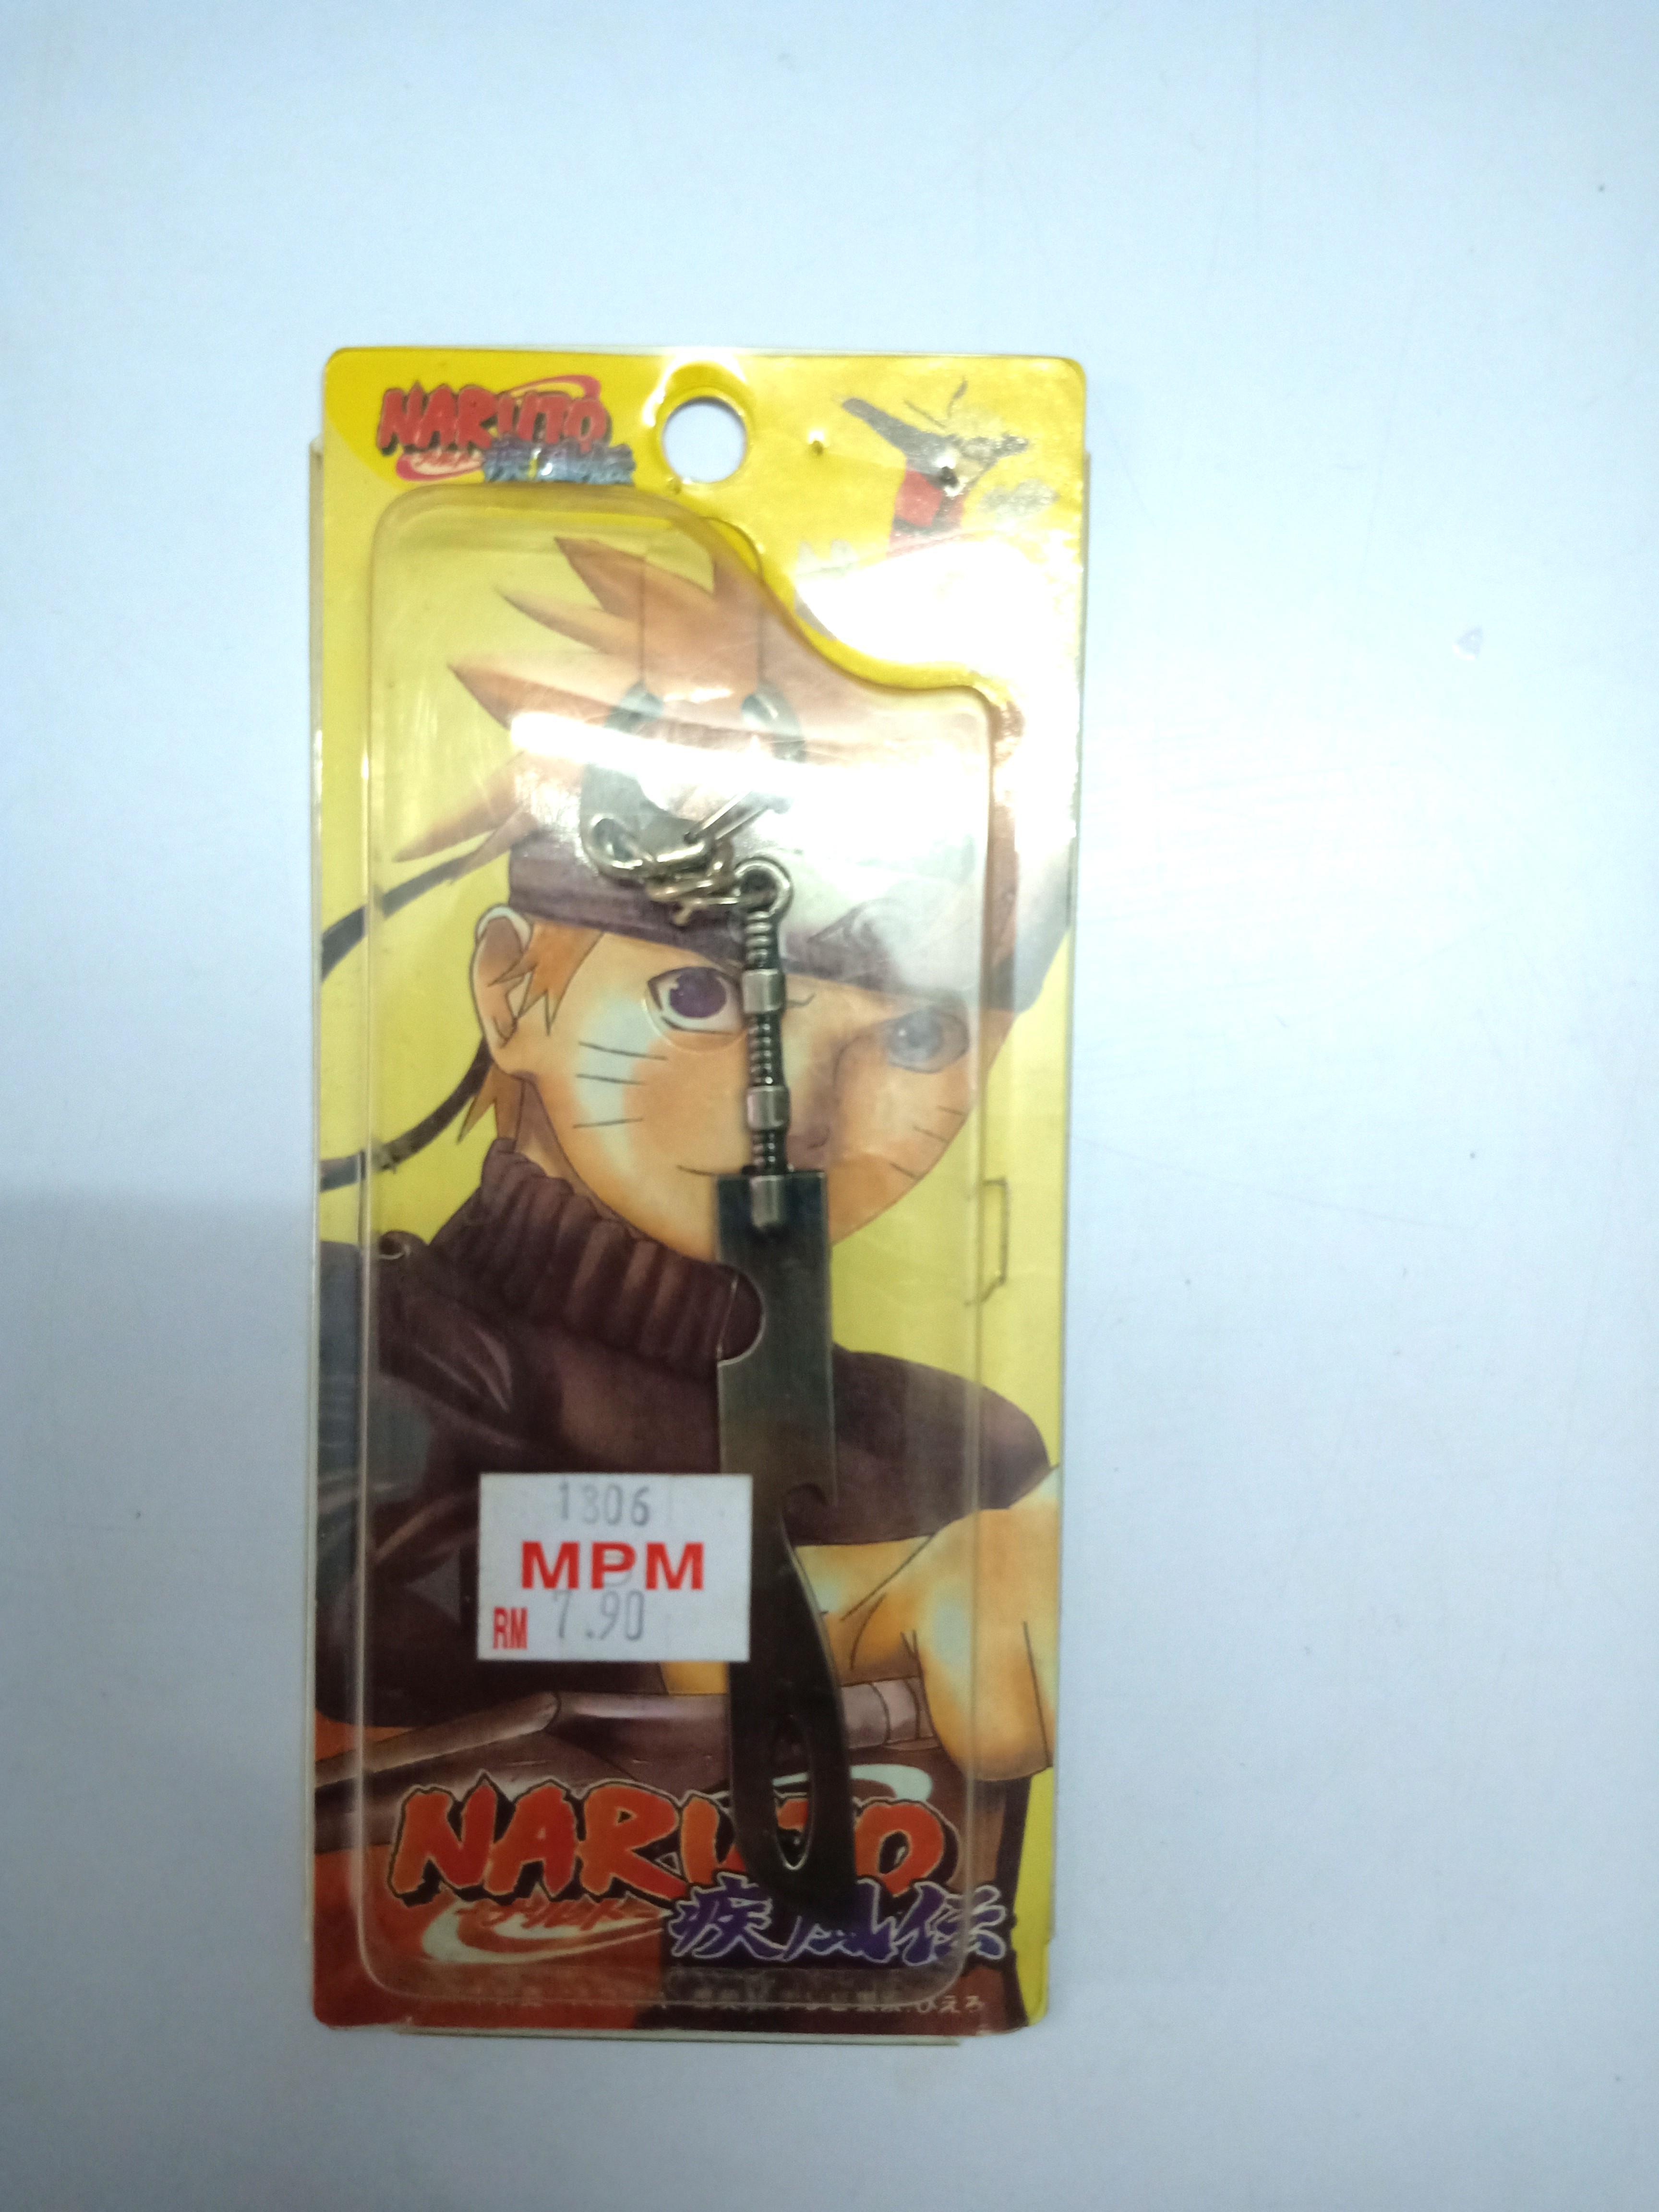 Naruto Shippuden Zabuza weapon Wielder Kubikiribocho keychain